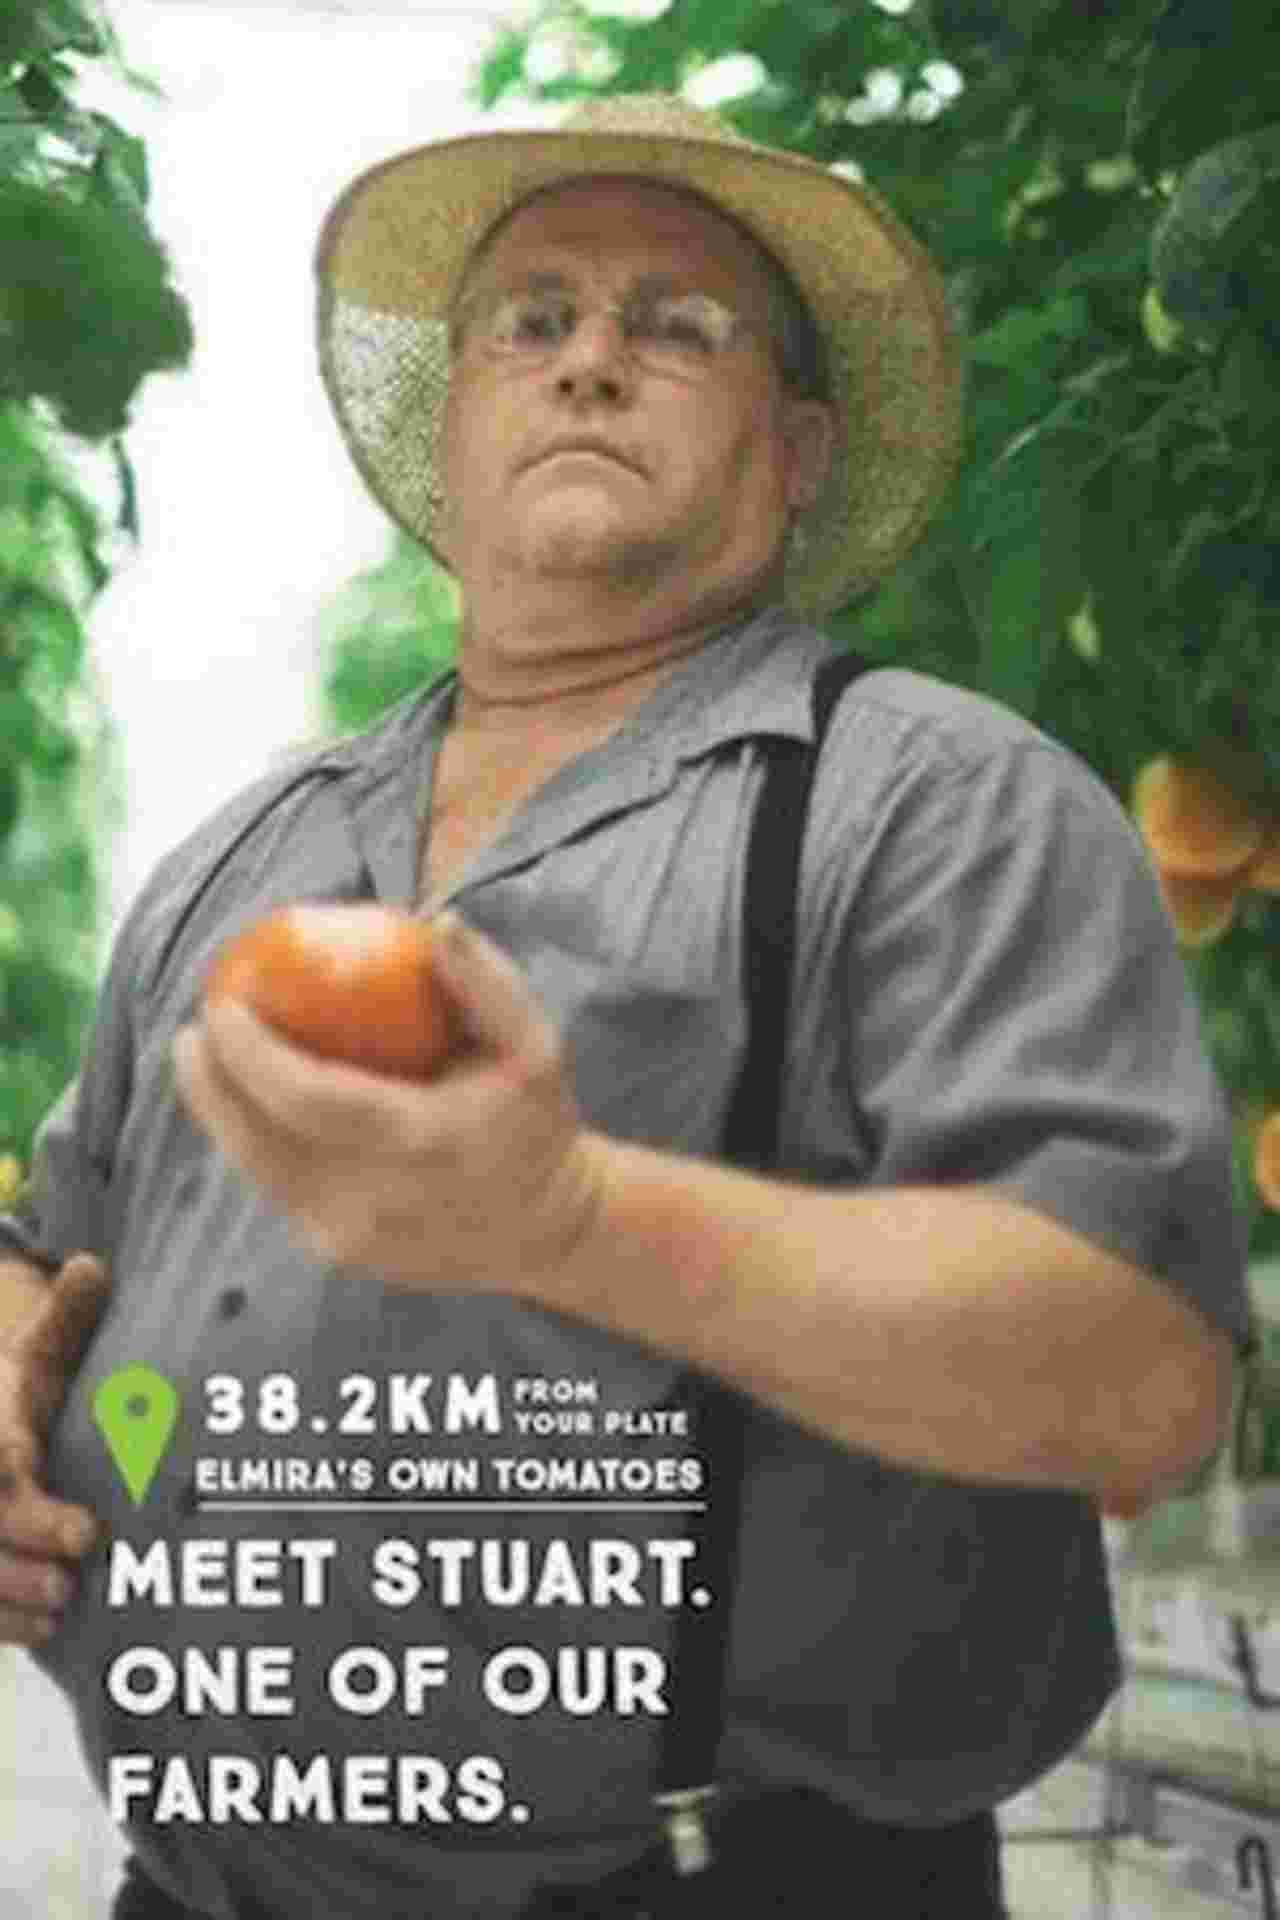 Elmira's Own Tomatoes